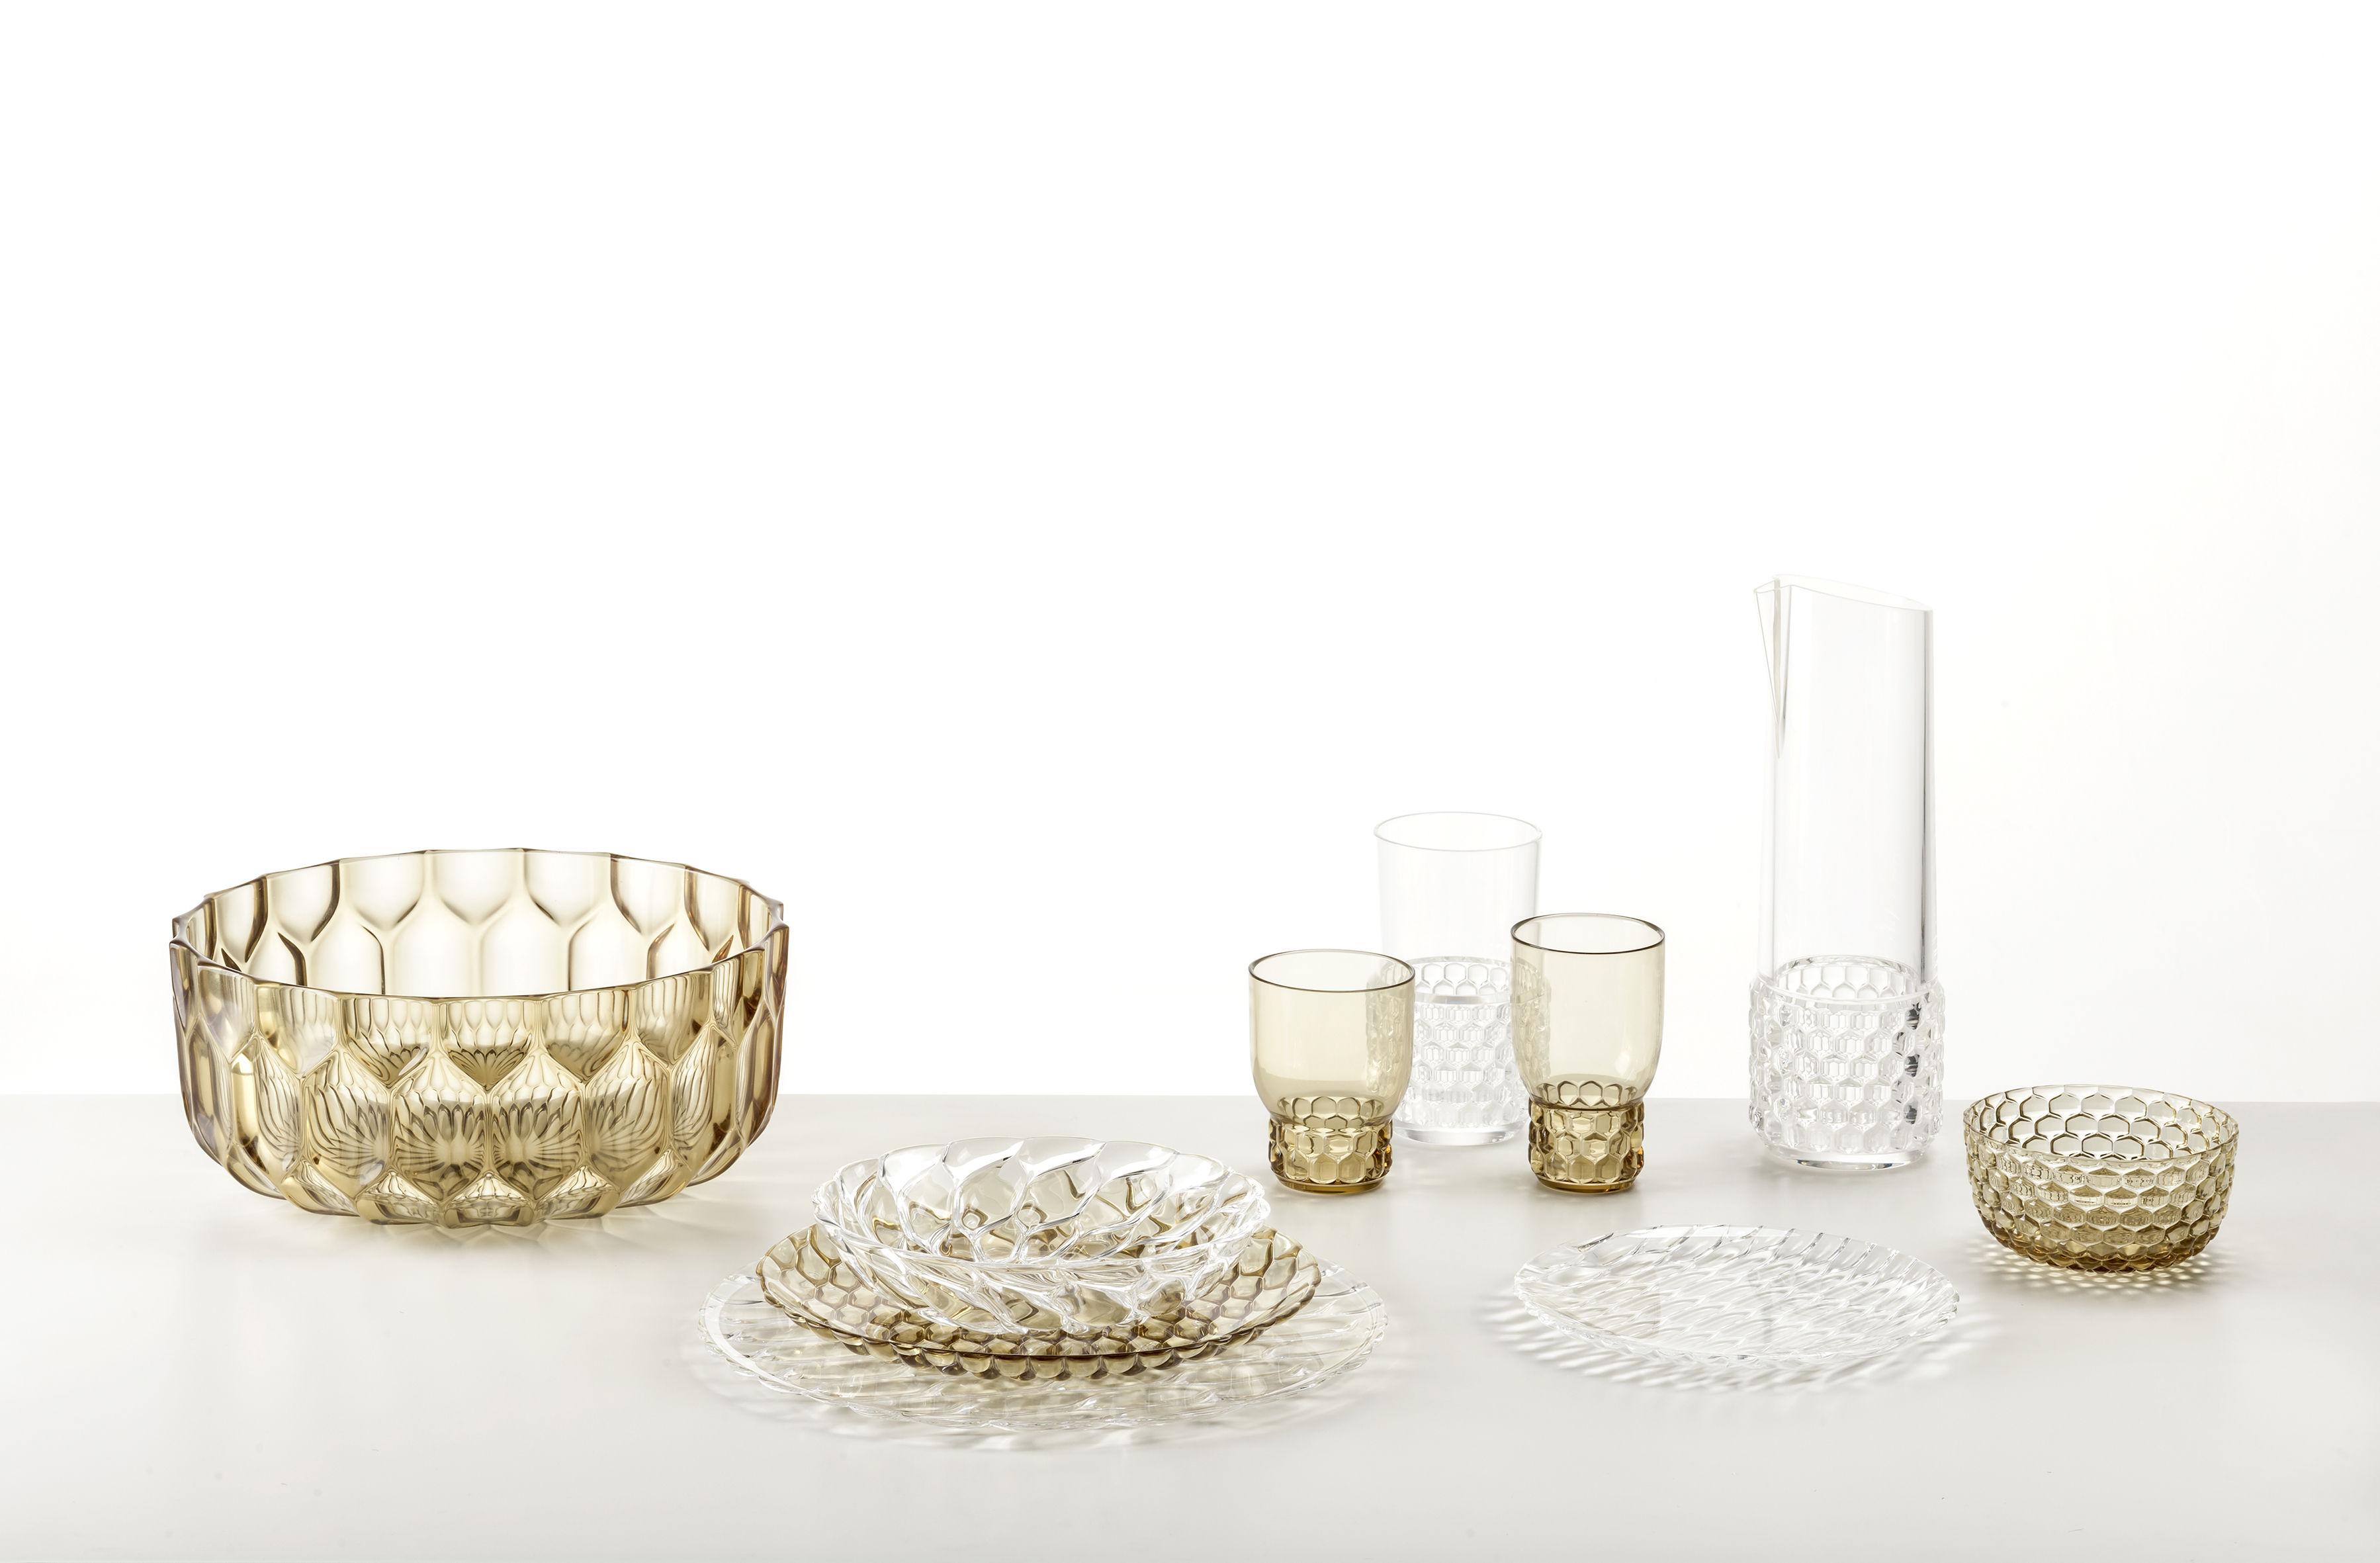 Assiette creuse jellies family 22 cm bleu ciel kartell for Solidworks design table zoom